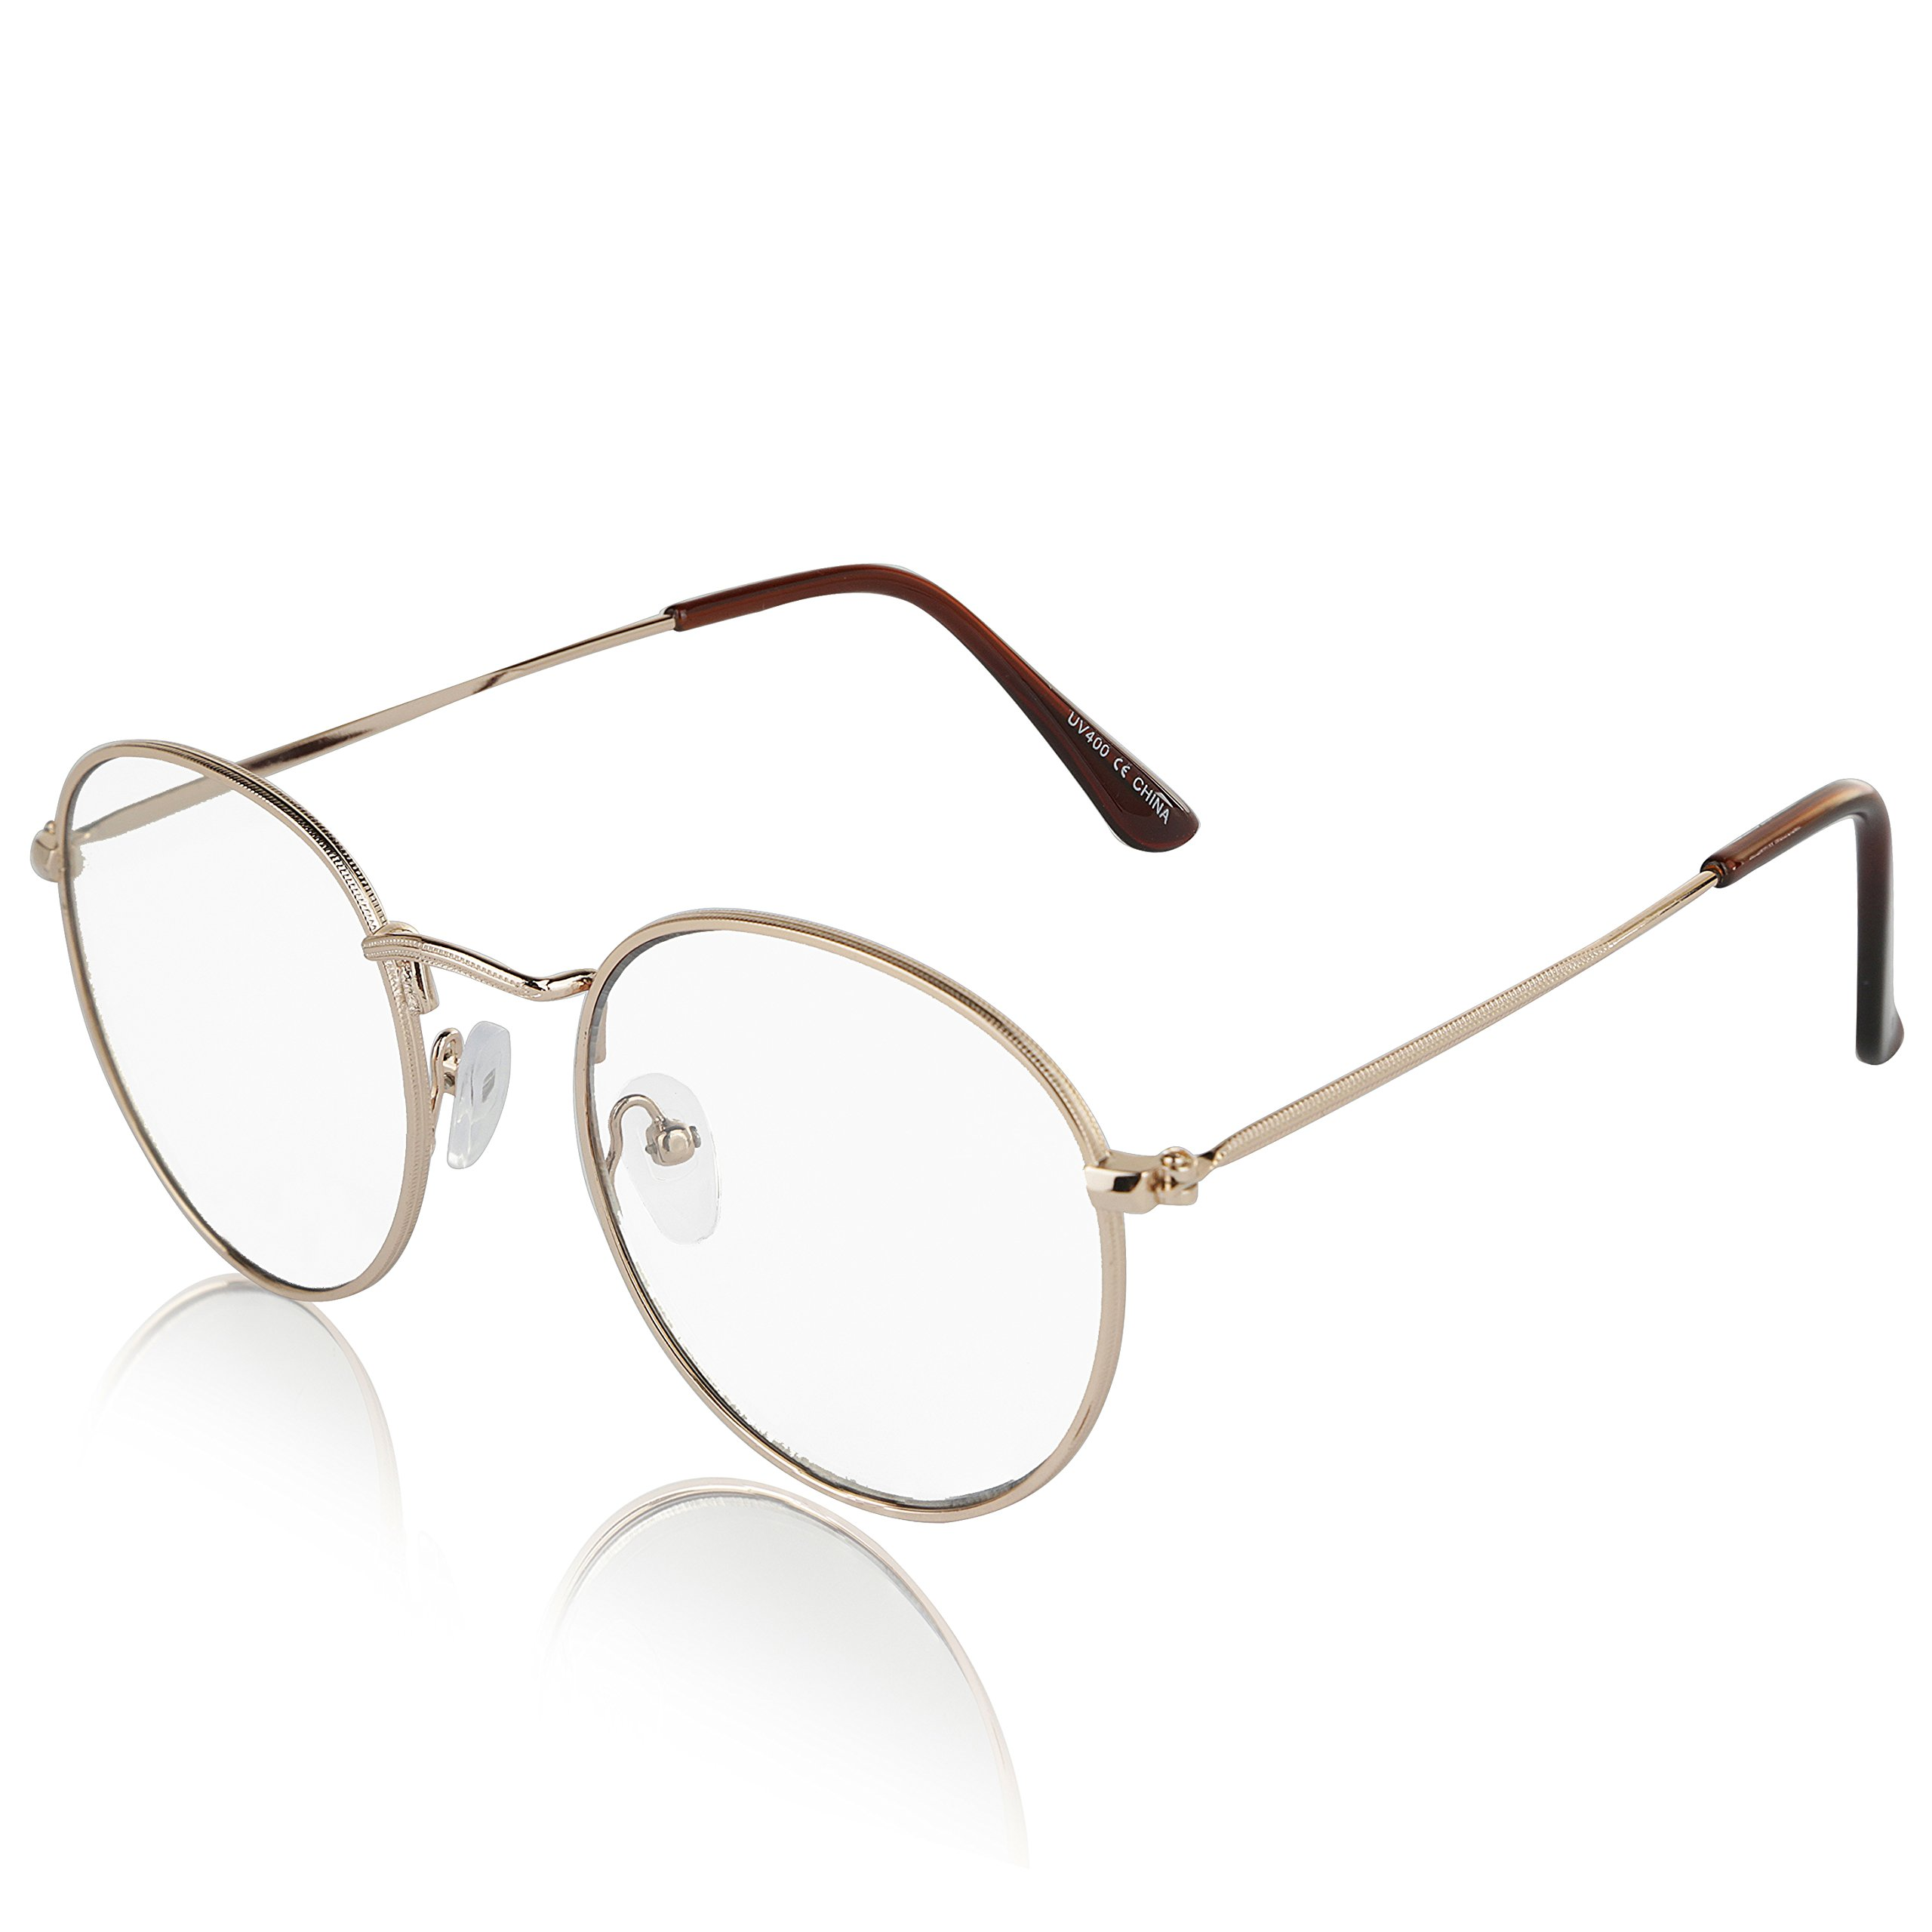 727e1fba131 Details about Non Prescription Retro Fake Clear Lens Gold Metal Frame  Eyeglasses Woman UV400